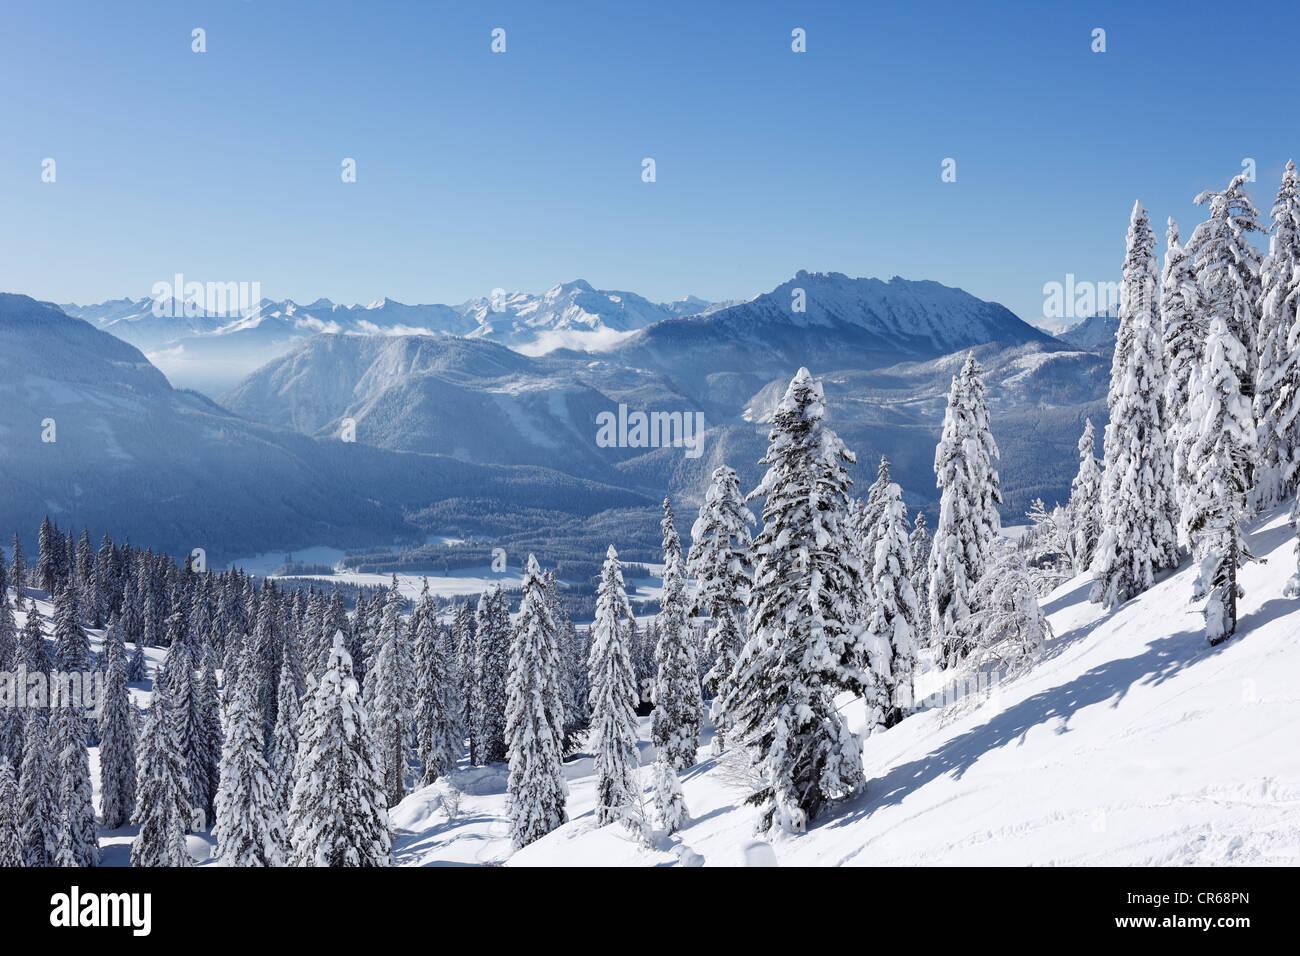 Austria, Styria, View of snowy fir tree on mountain - Stock Image